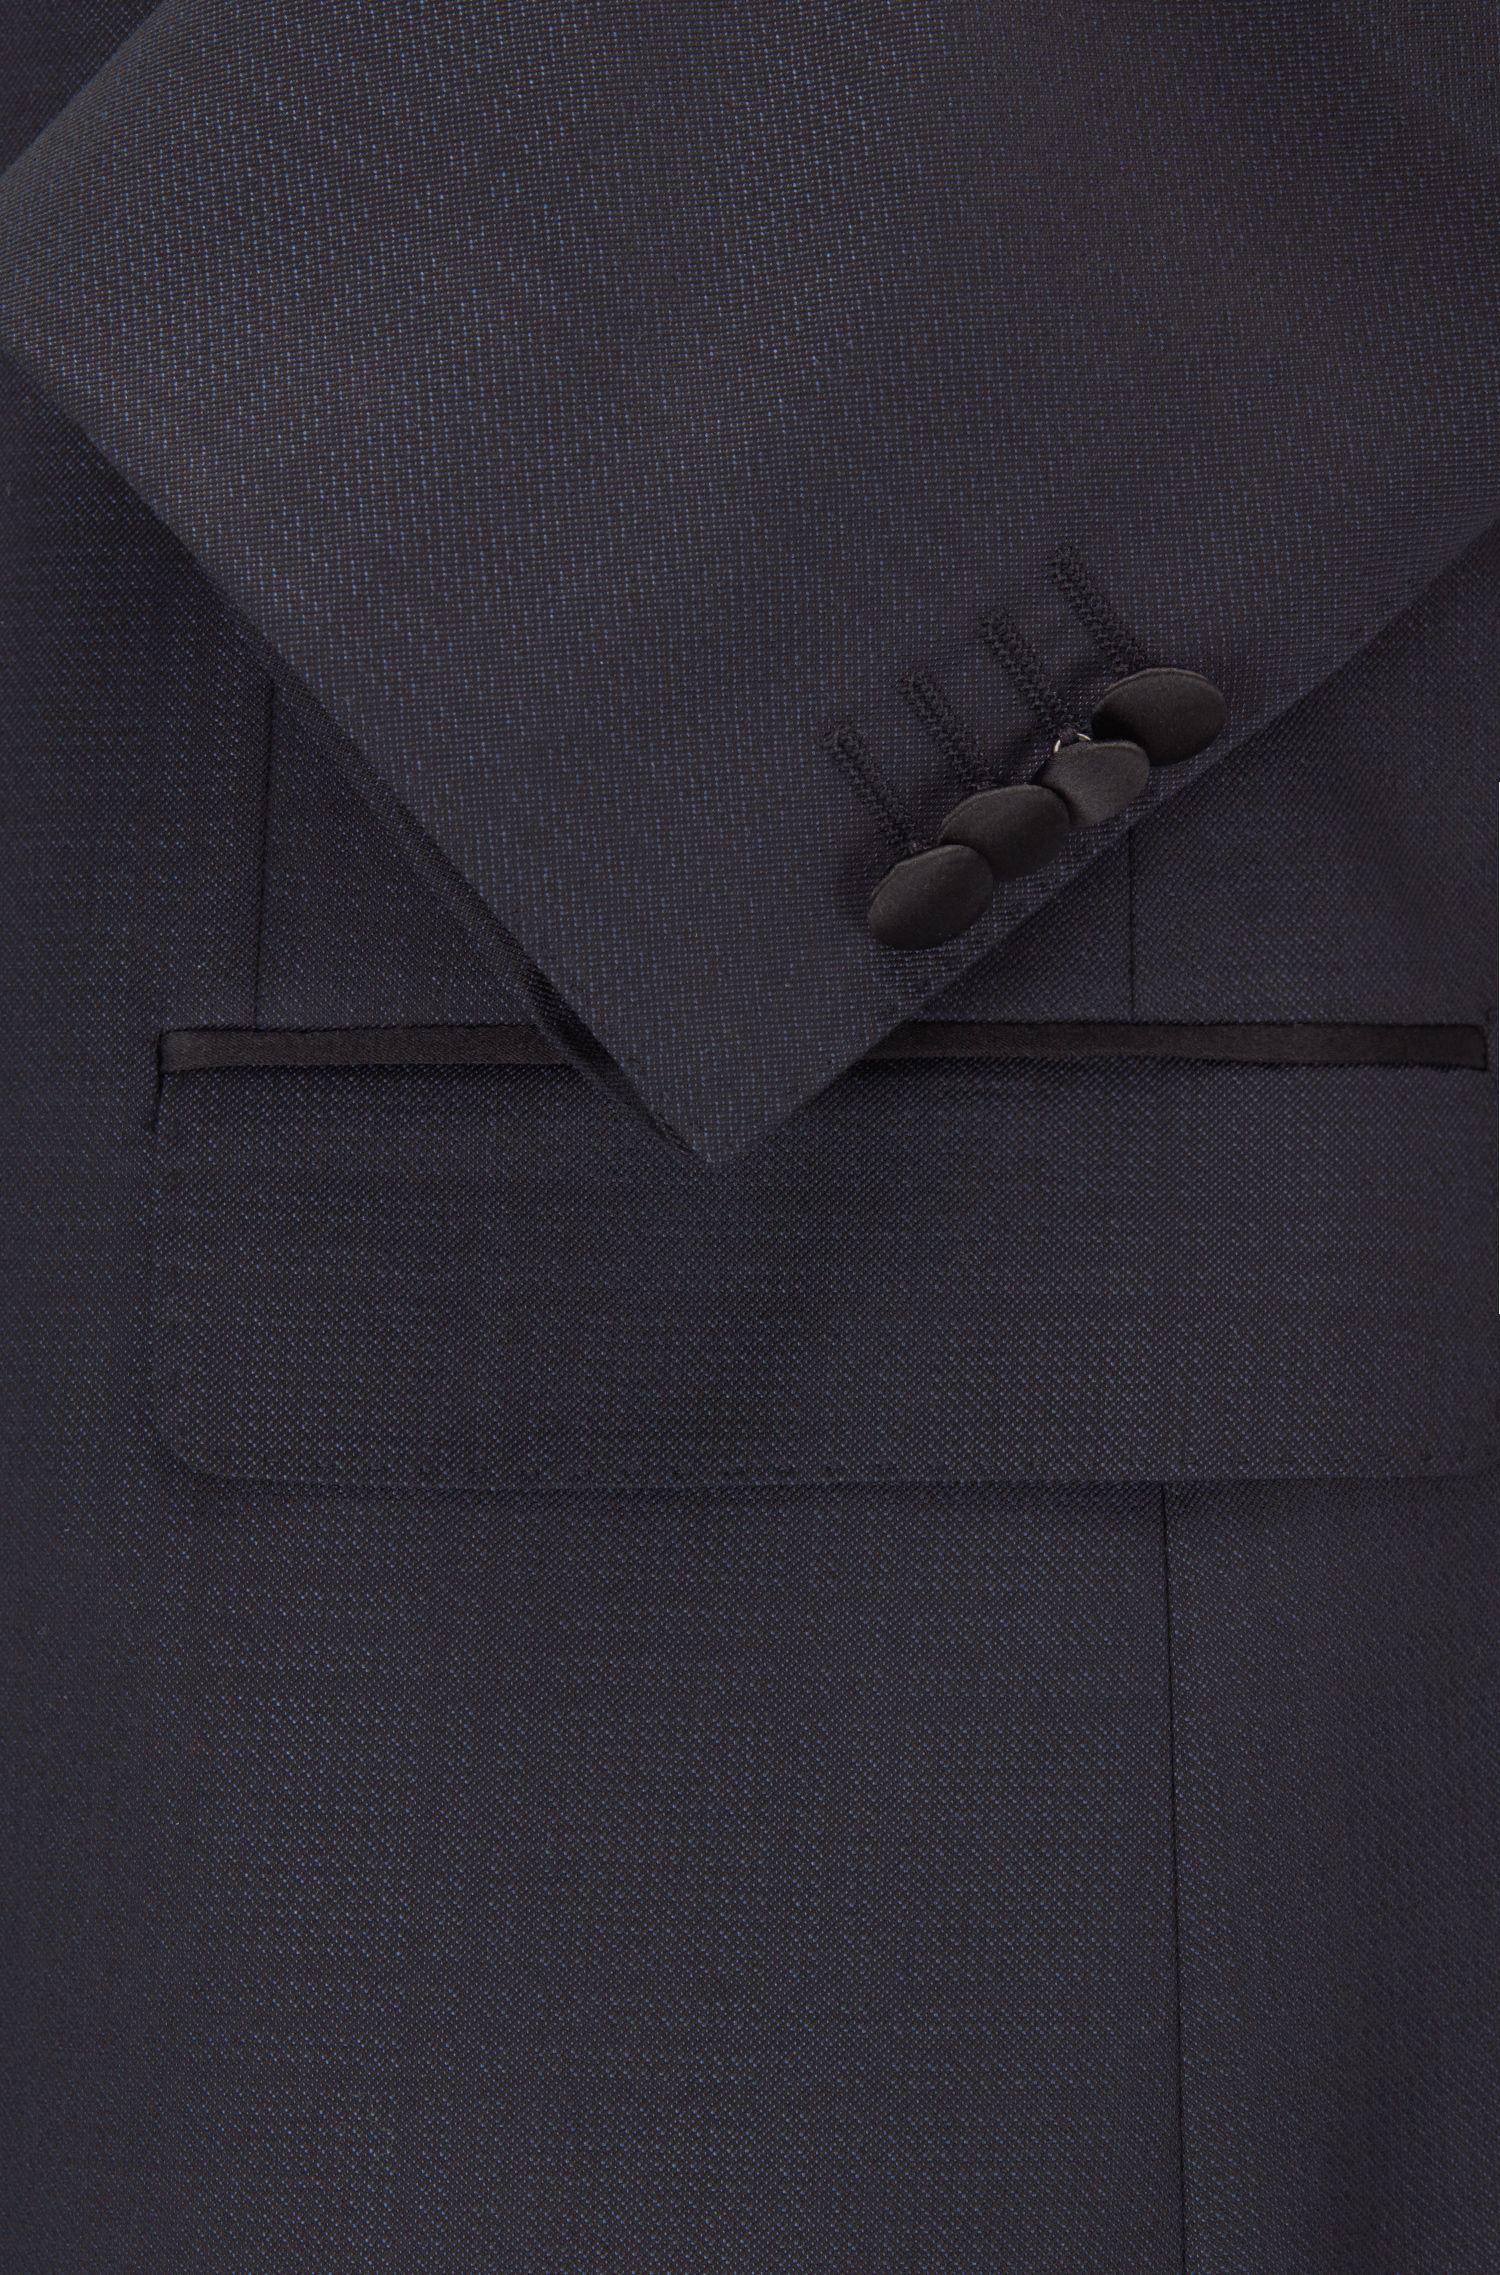 Tonal Plaid Virgin Wool-Silk Tuxedo, Regular Fit | Jelvan/Livan, Dark Blue